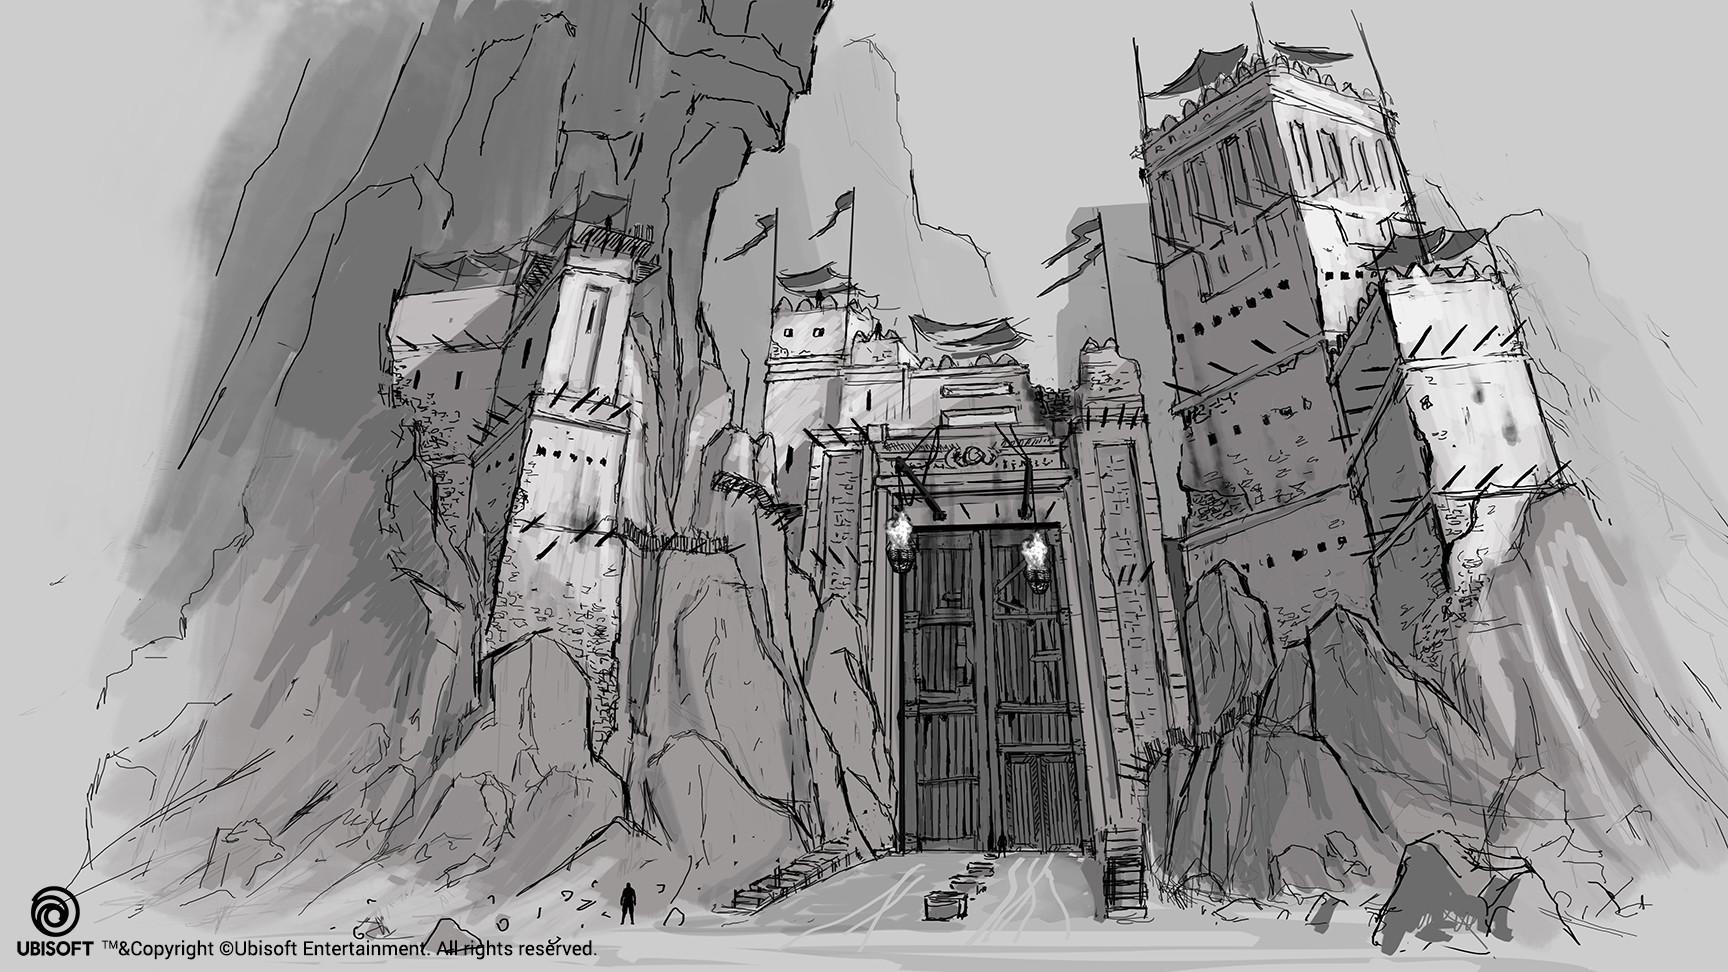 eddie-bennun-fortificationt-gate-frontview-sketch-lr-logo